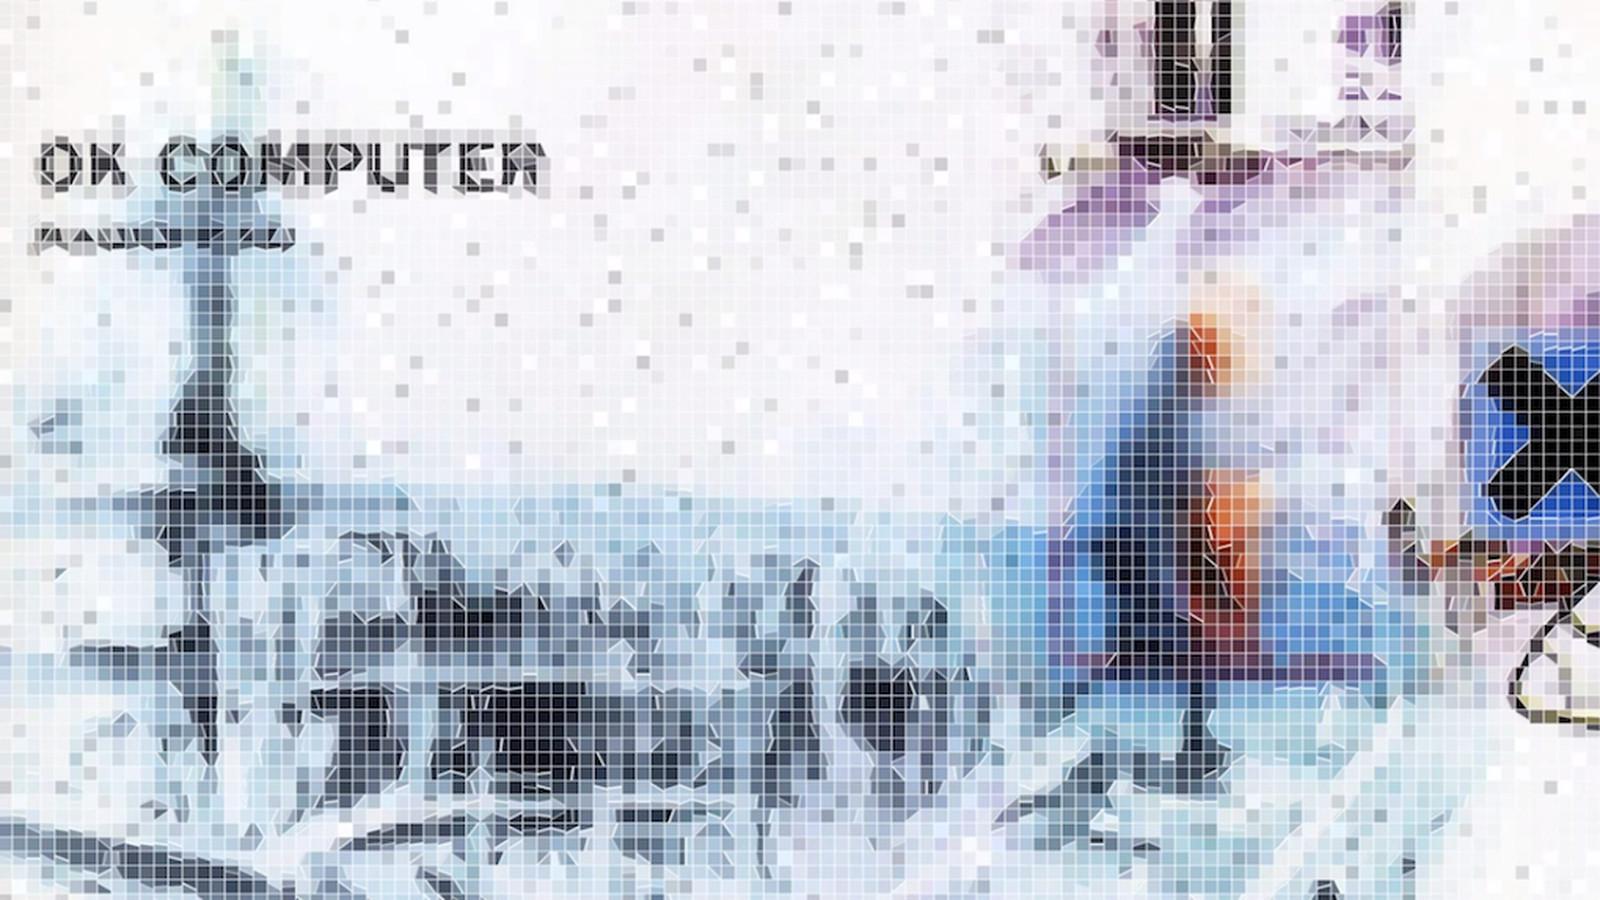 Aviation Wallpaper Iphone X Radiohead S Ok Computer And Kid A Get An 8 Bit